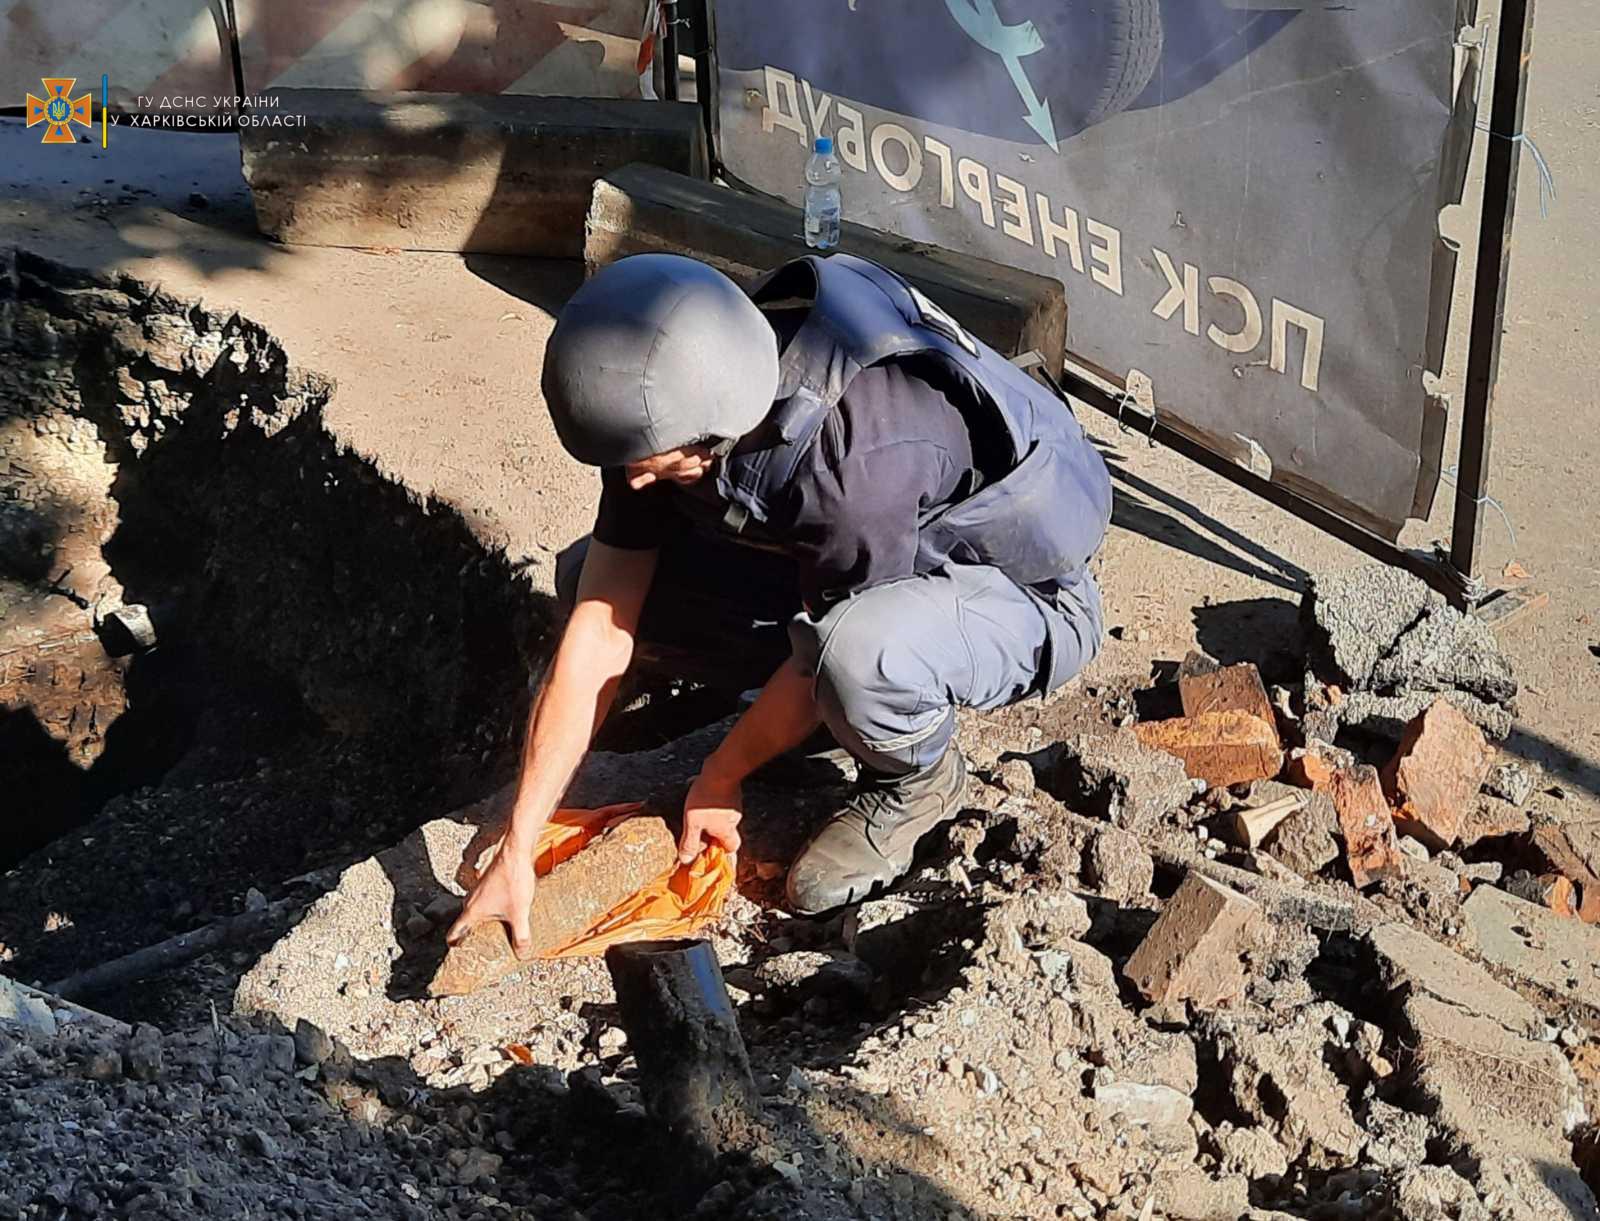 В Харькове на Салтовке нашли артснаряд (фото)